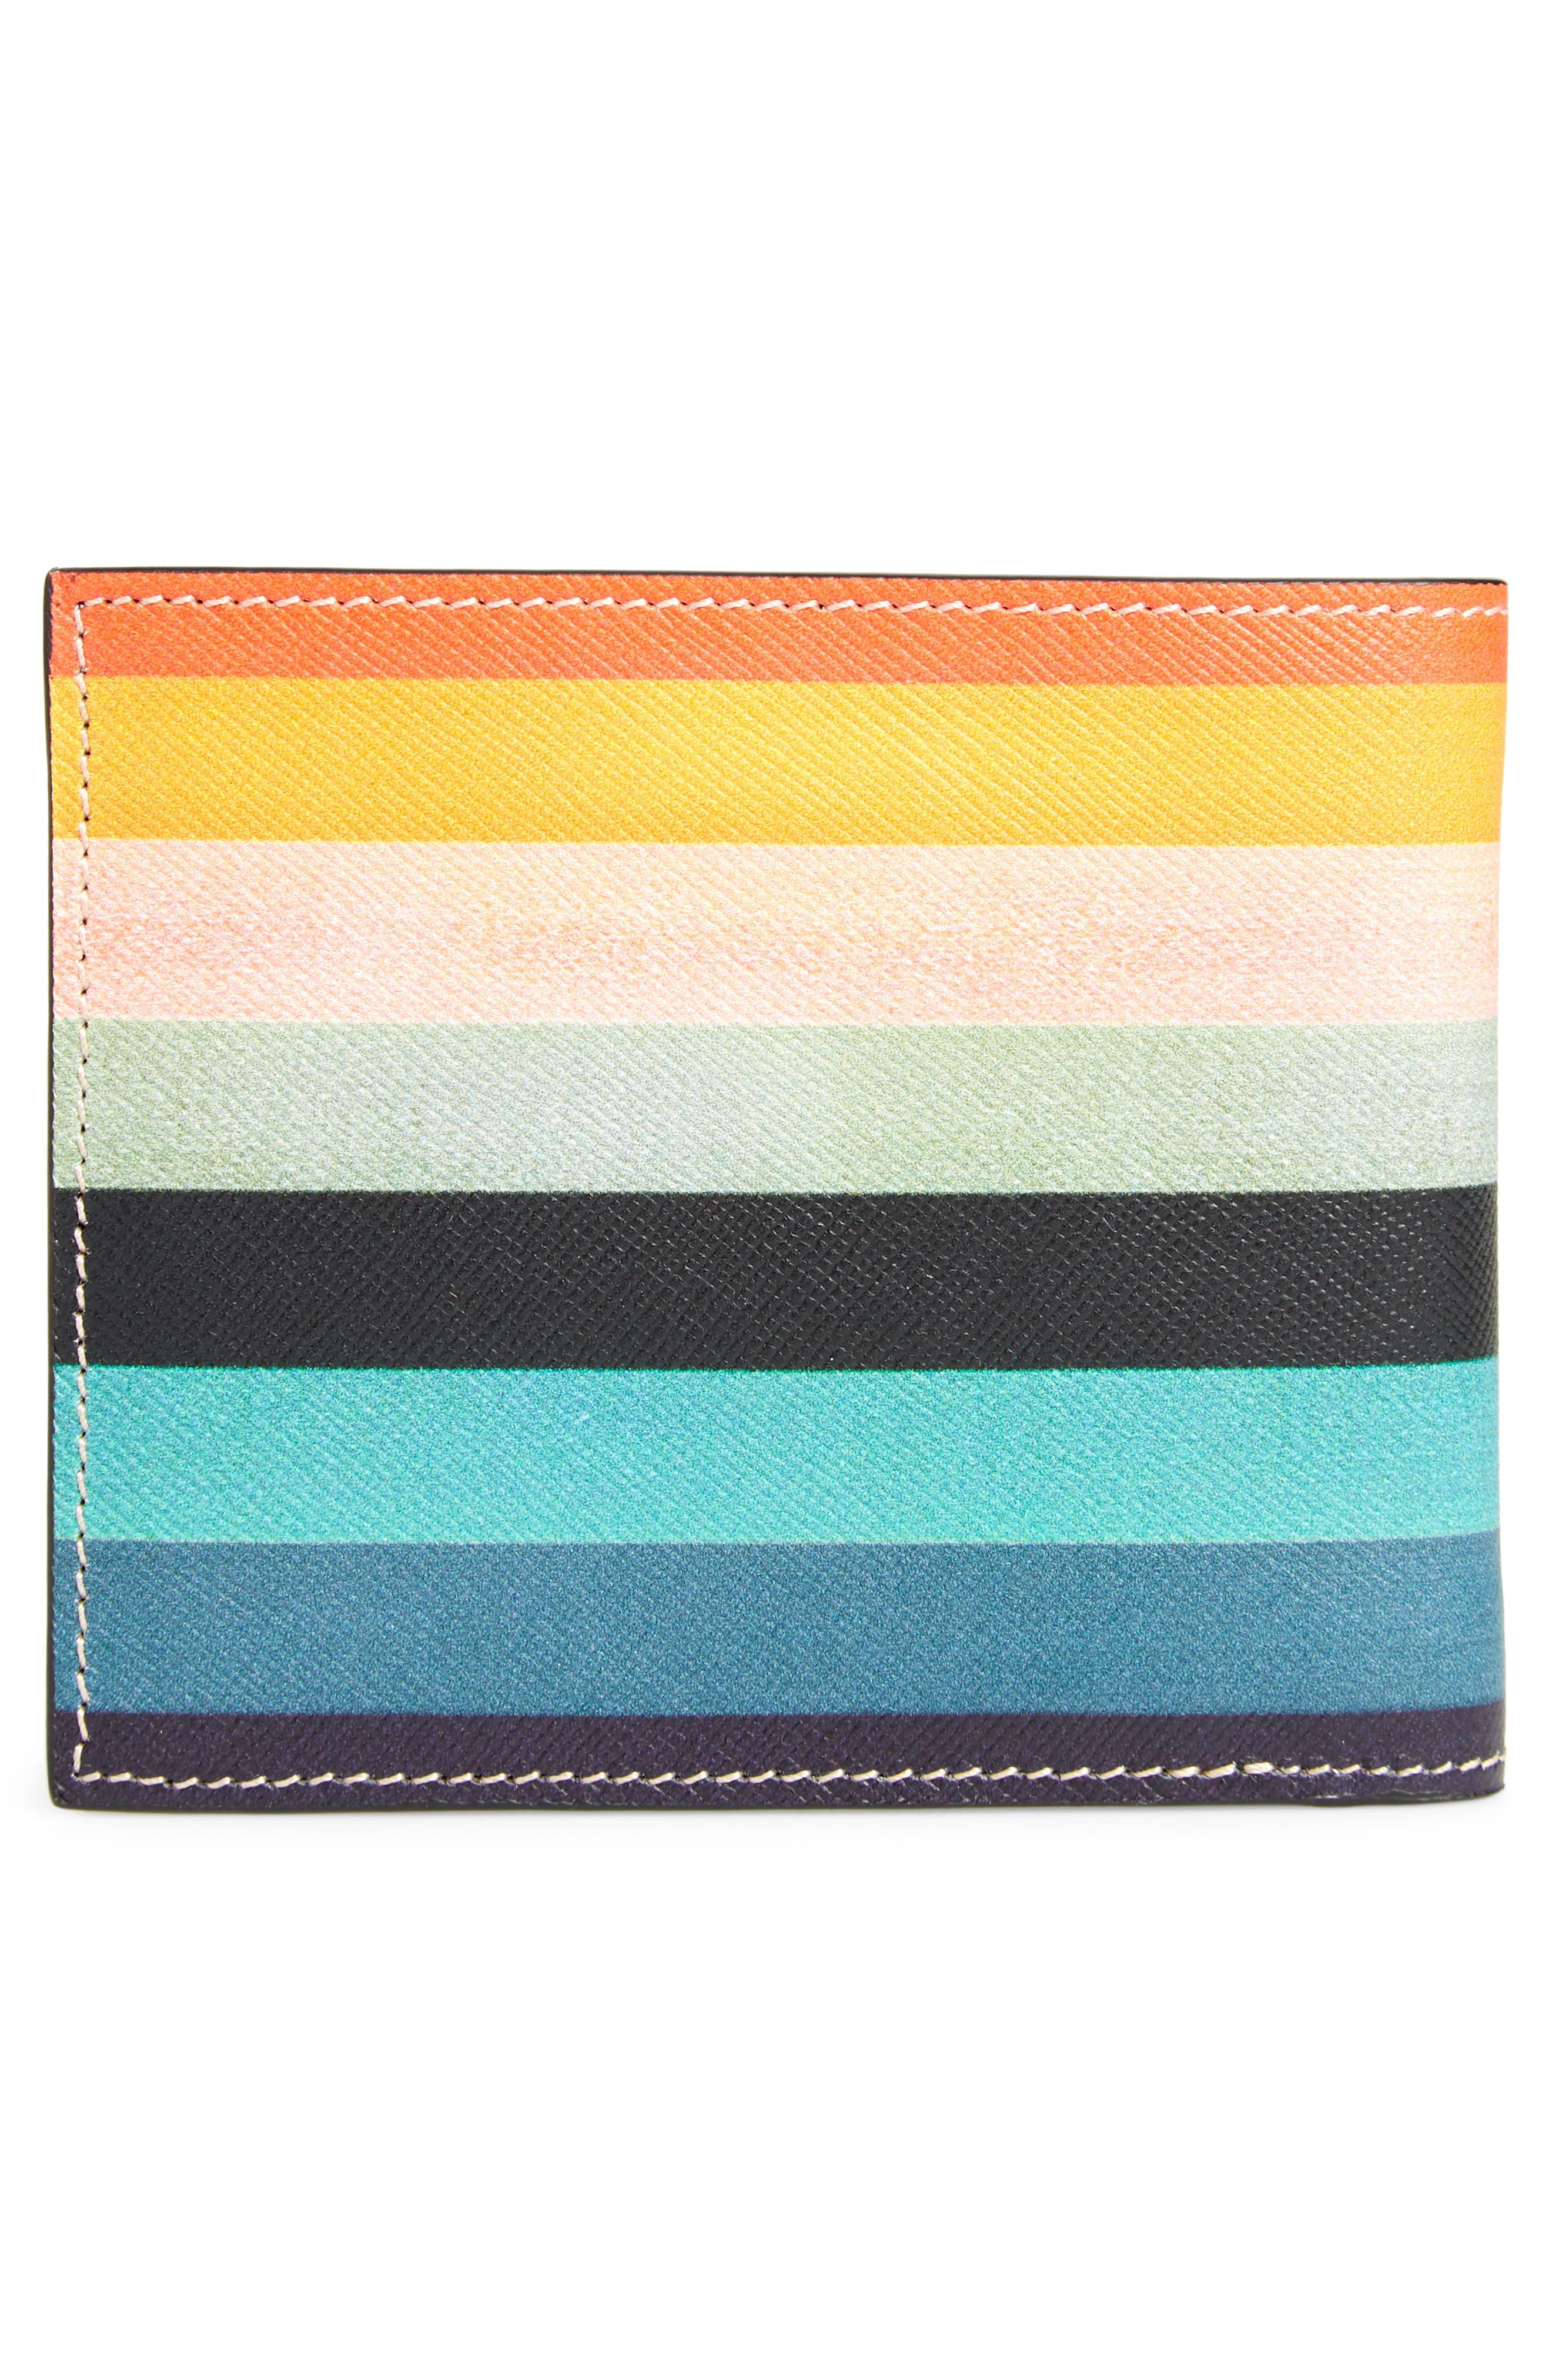 Artist Stripes Leather Wallet,                             Alternate thumbnail 3, color,                             Artist Stripe